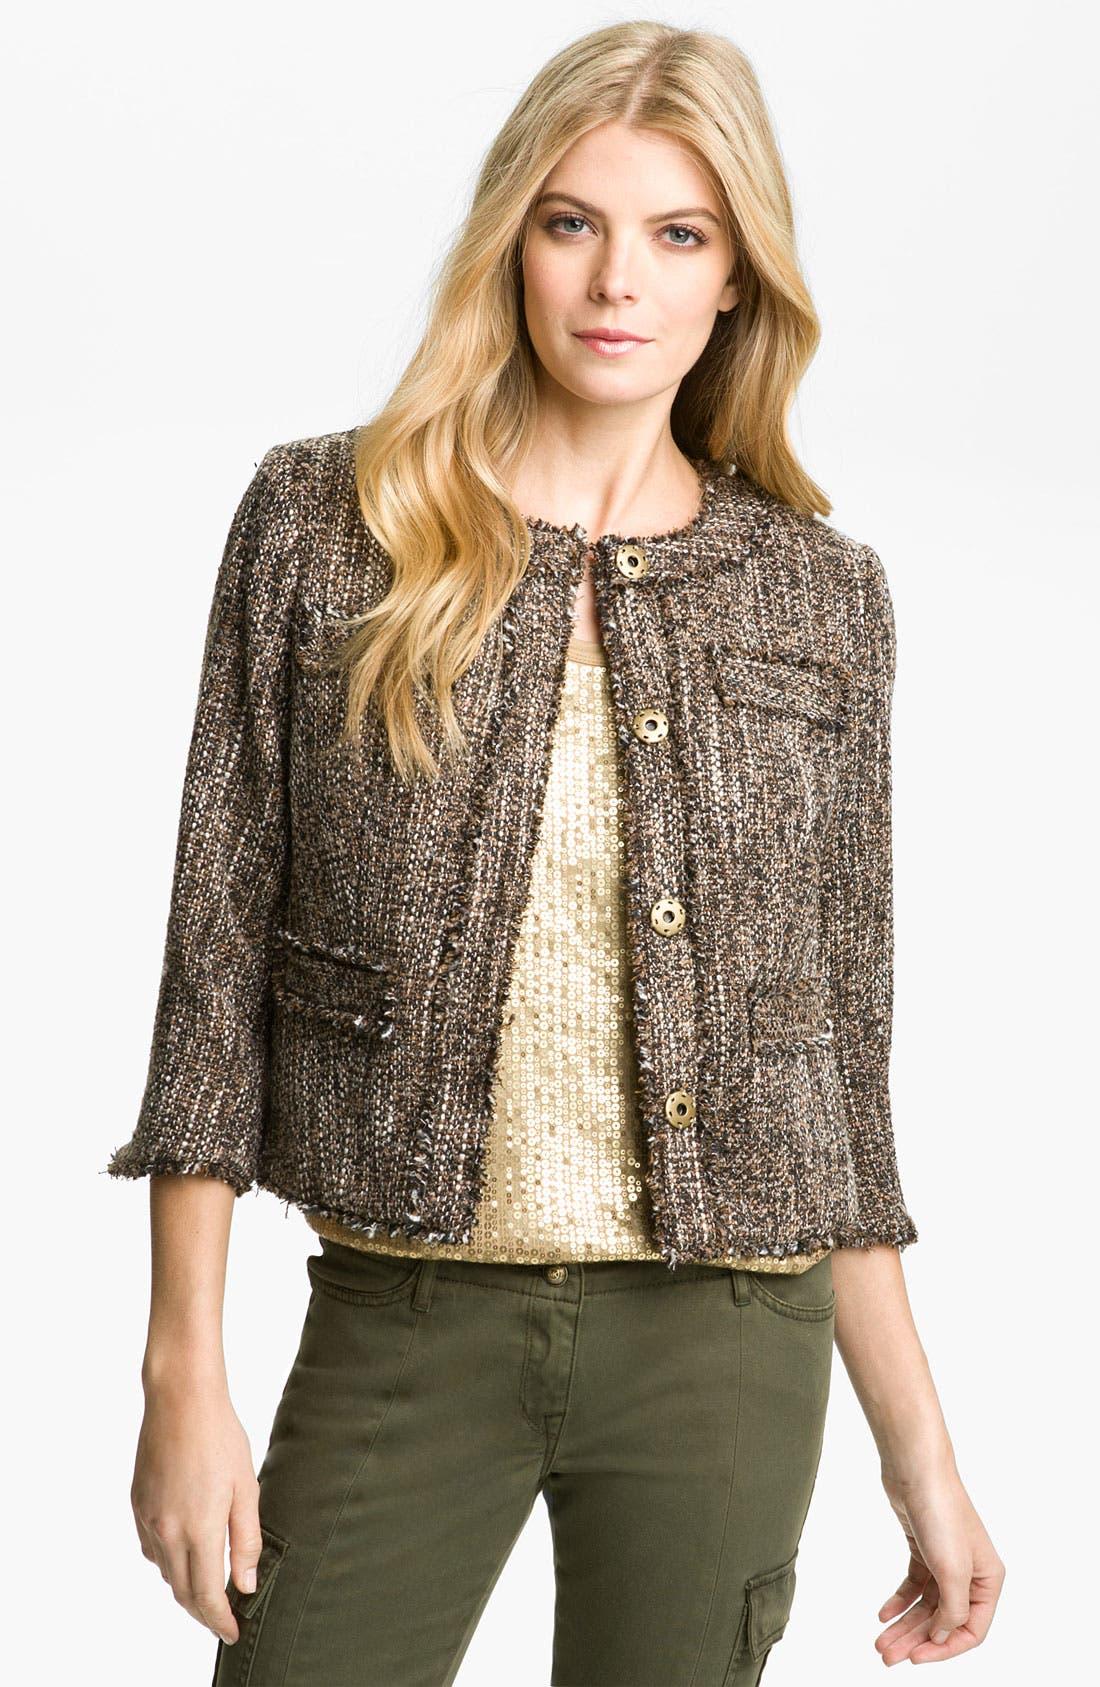 Alternate Image 1 Selected - MICHAEL Michael Kors Tweed Knit Jacket